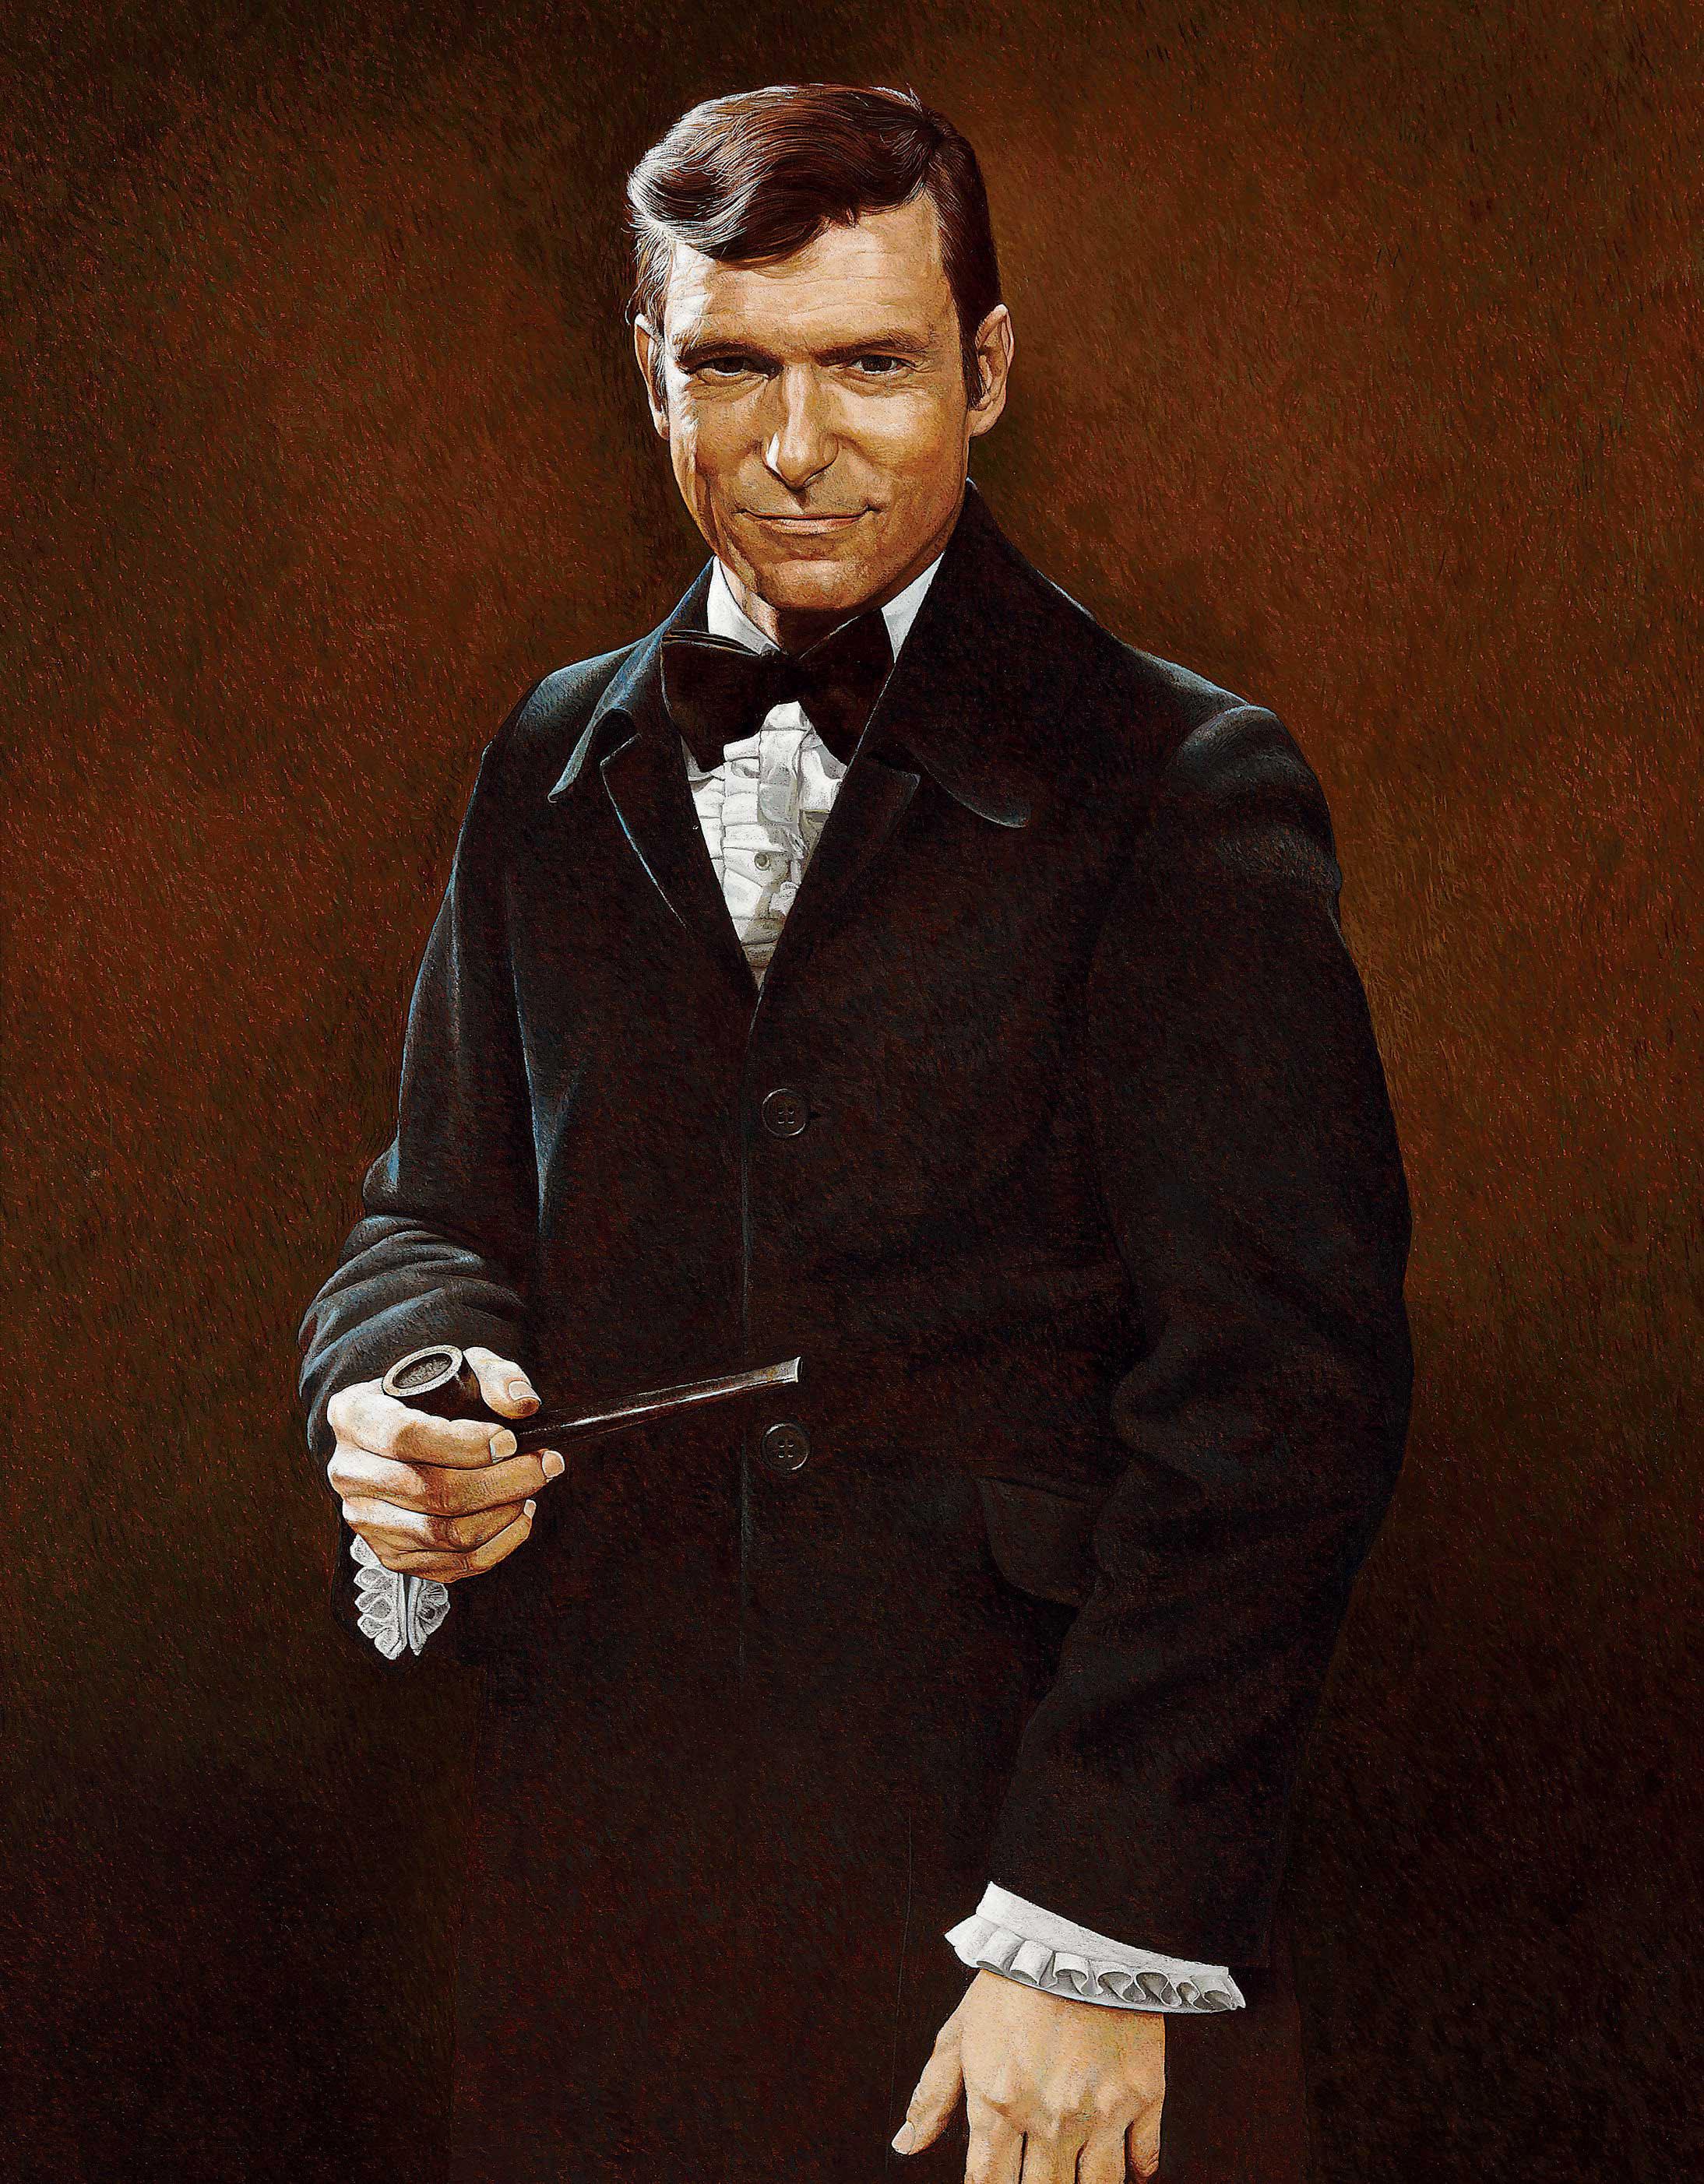 Portrait of Hugh Hefner